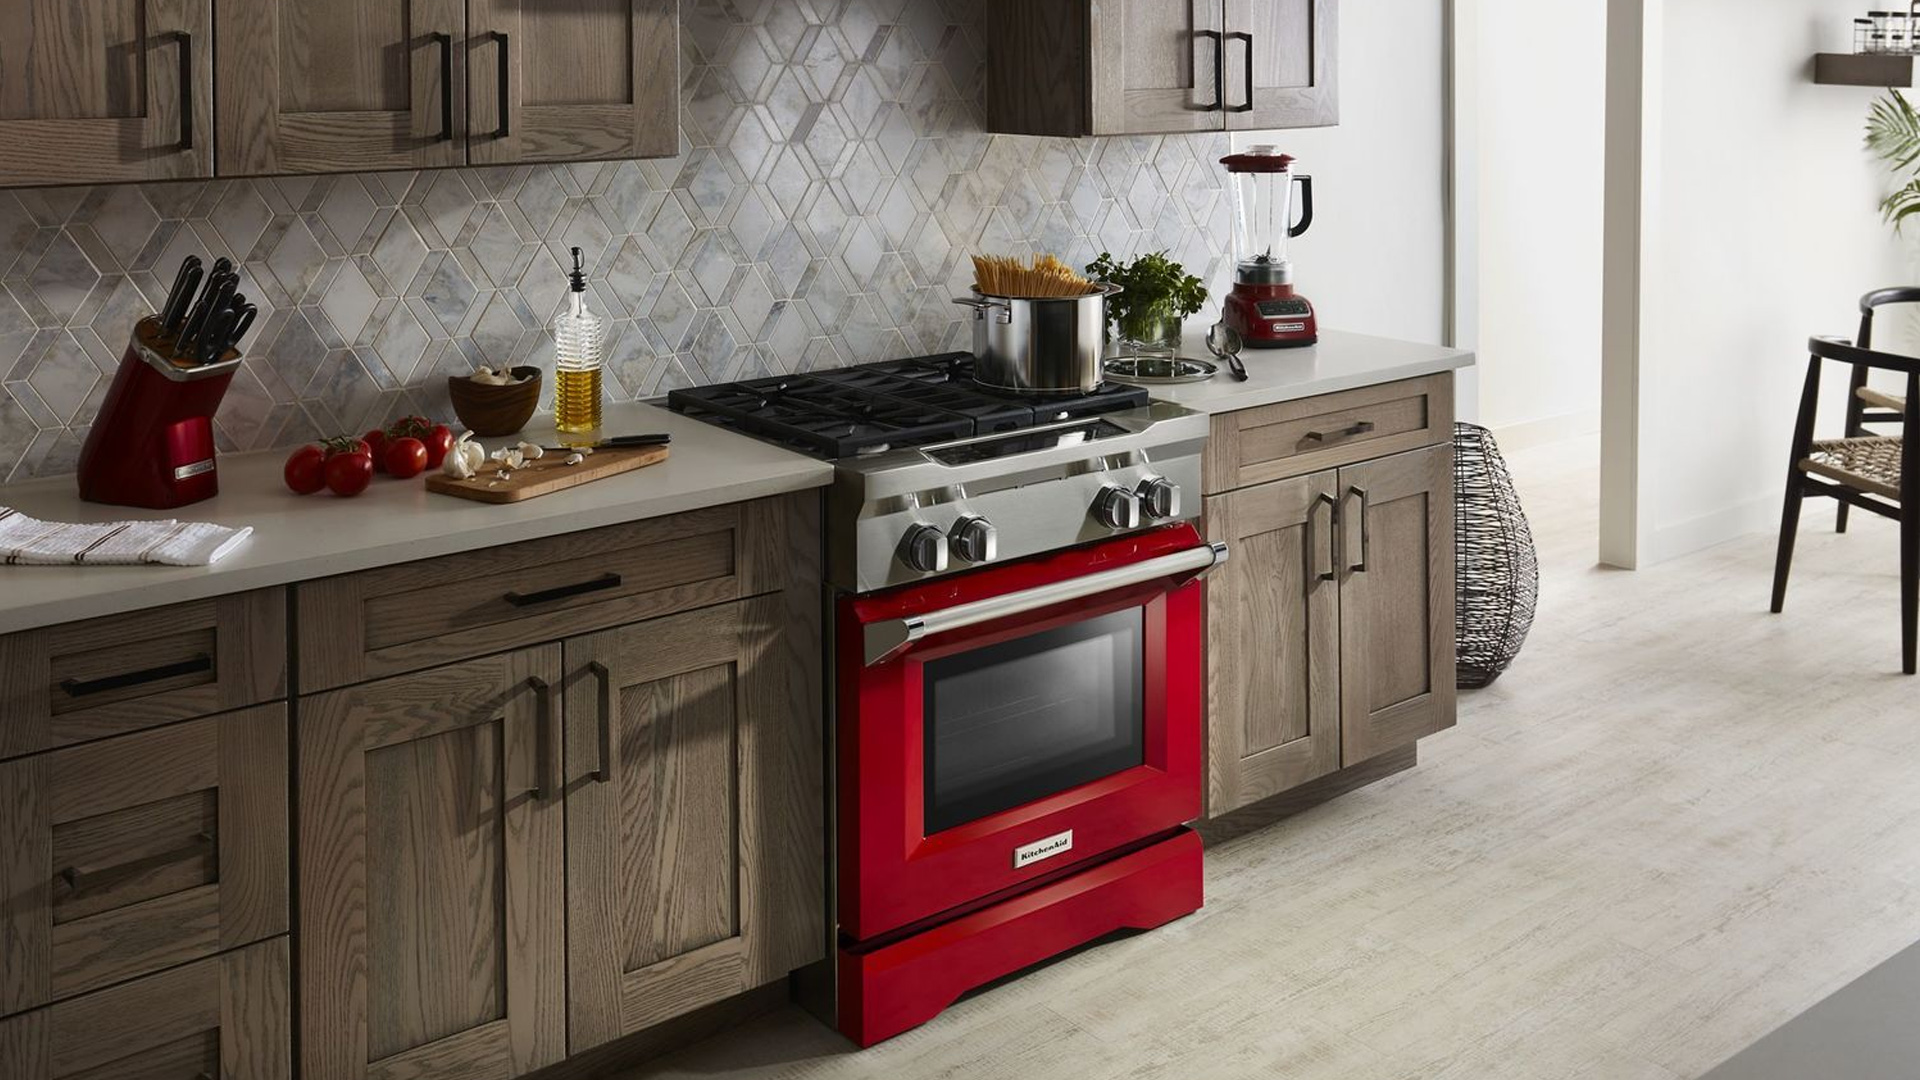 KitchenAid Freestanding Dual Fuel Range Repair | KitchenAid Repairs